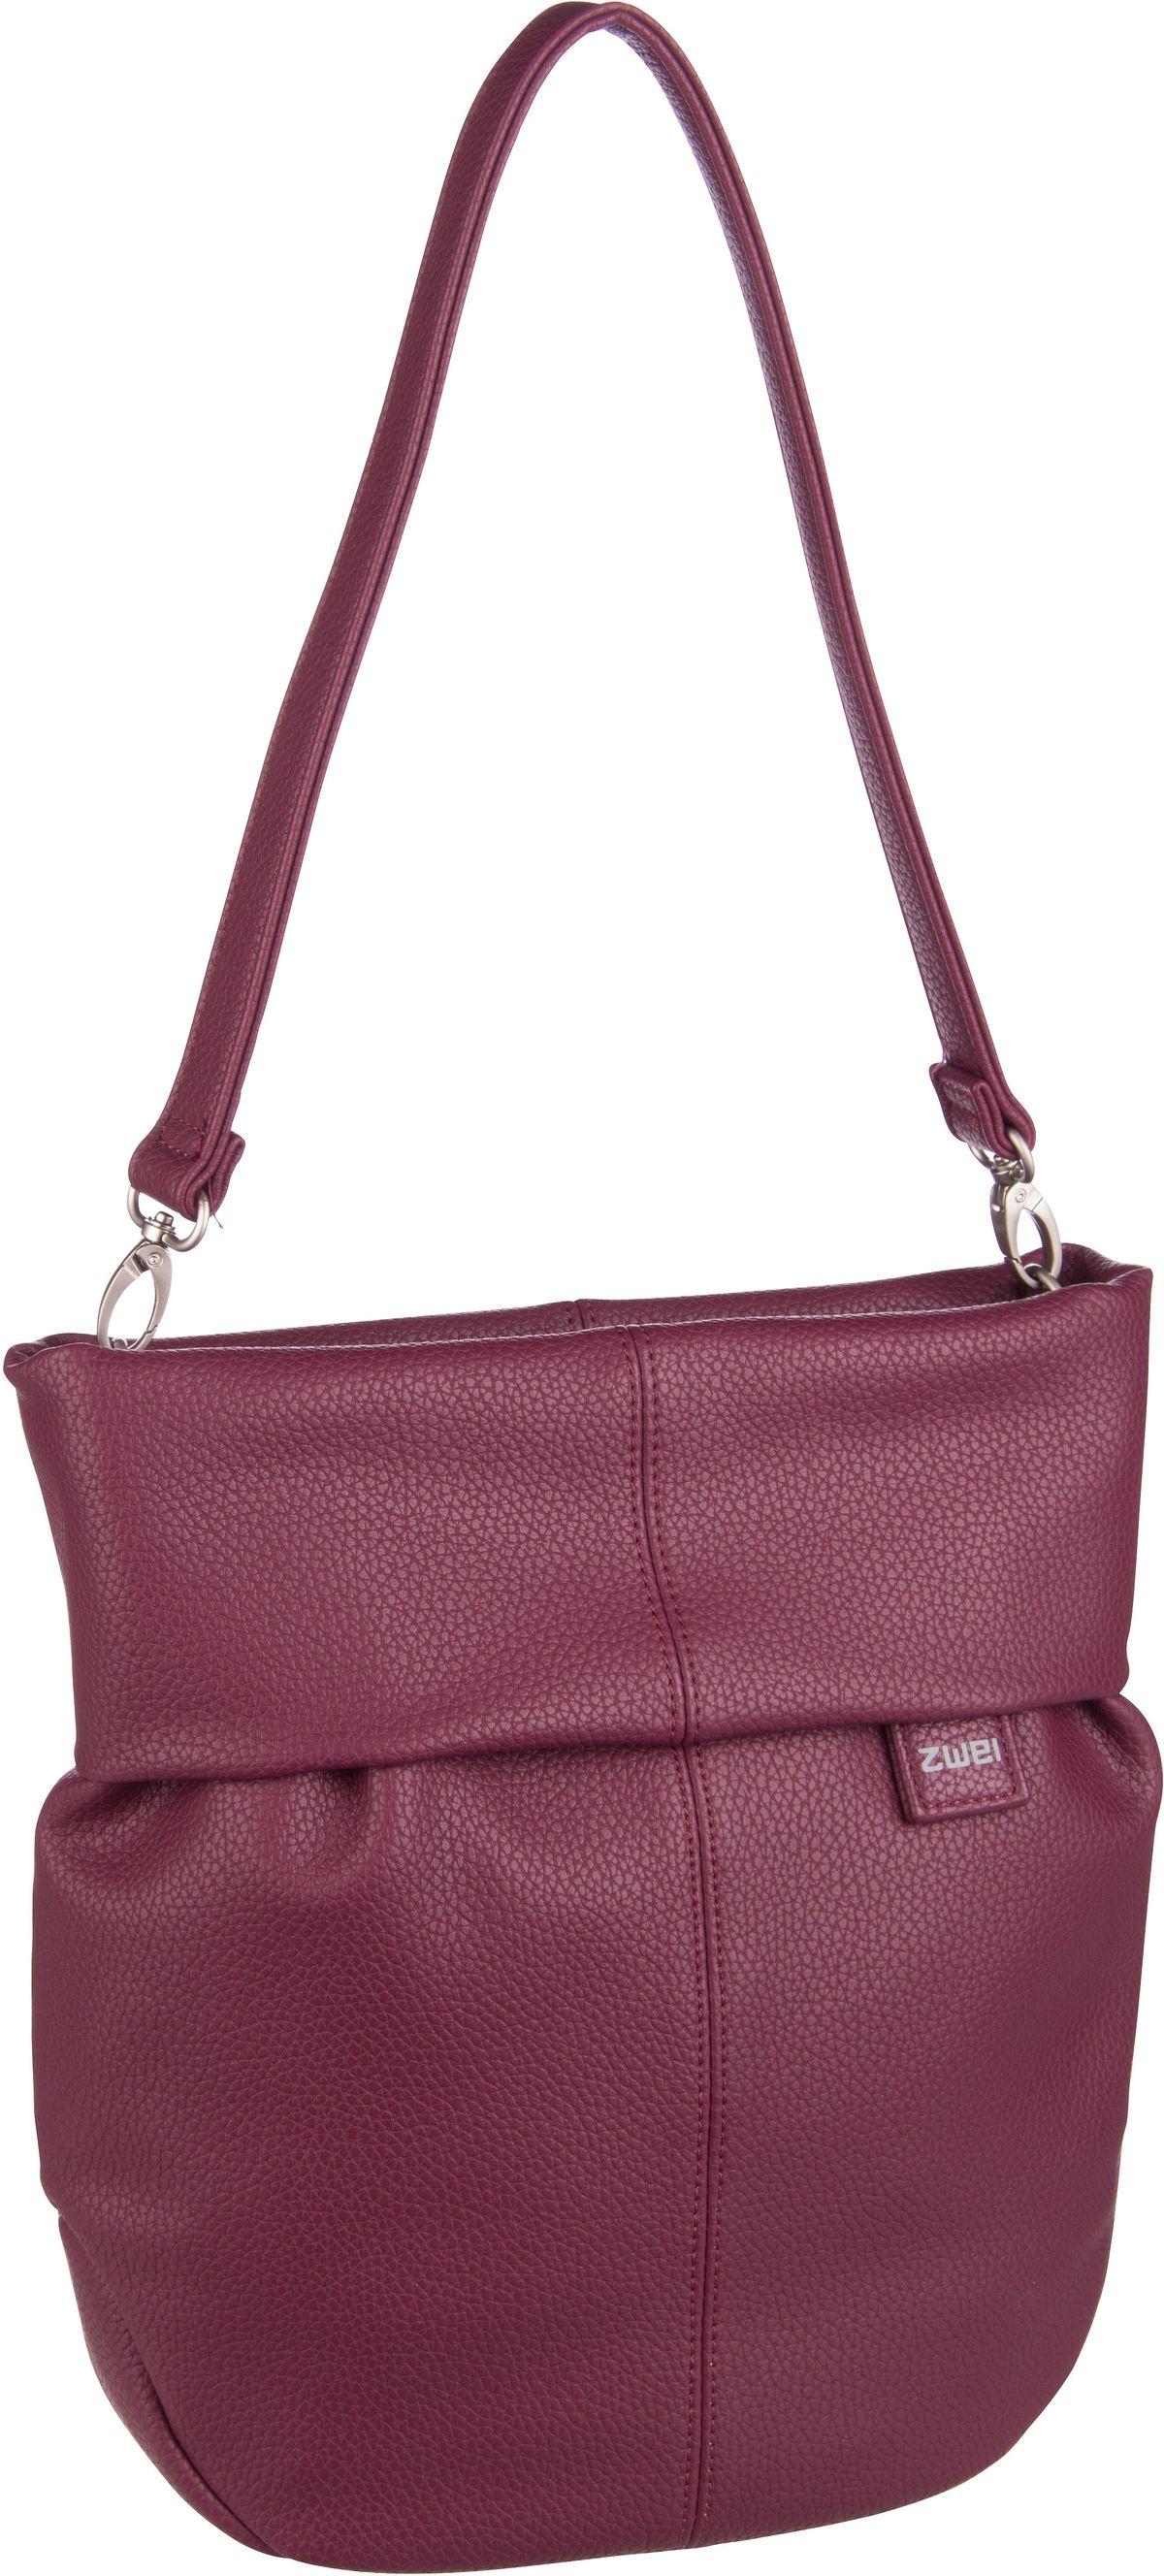 Handtasche Mademoiselle M100 Bordeaux (5 Liter)